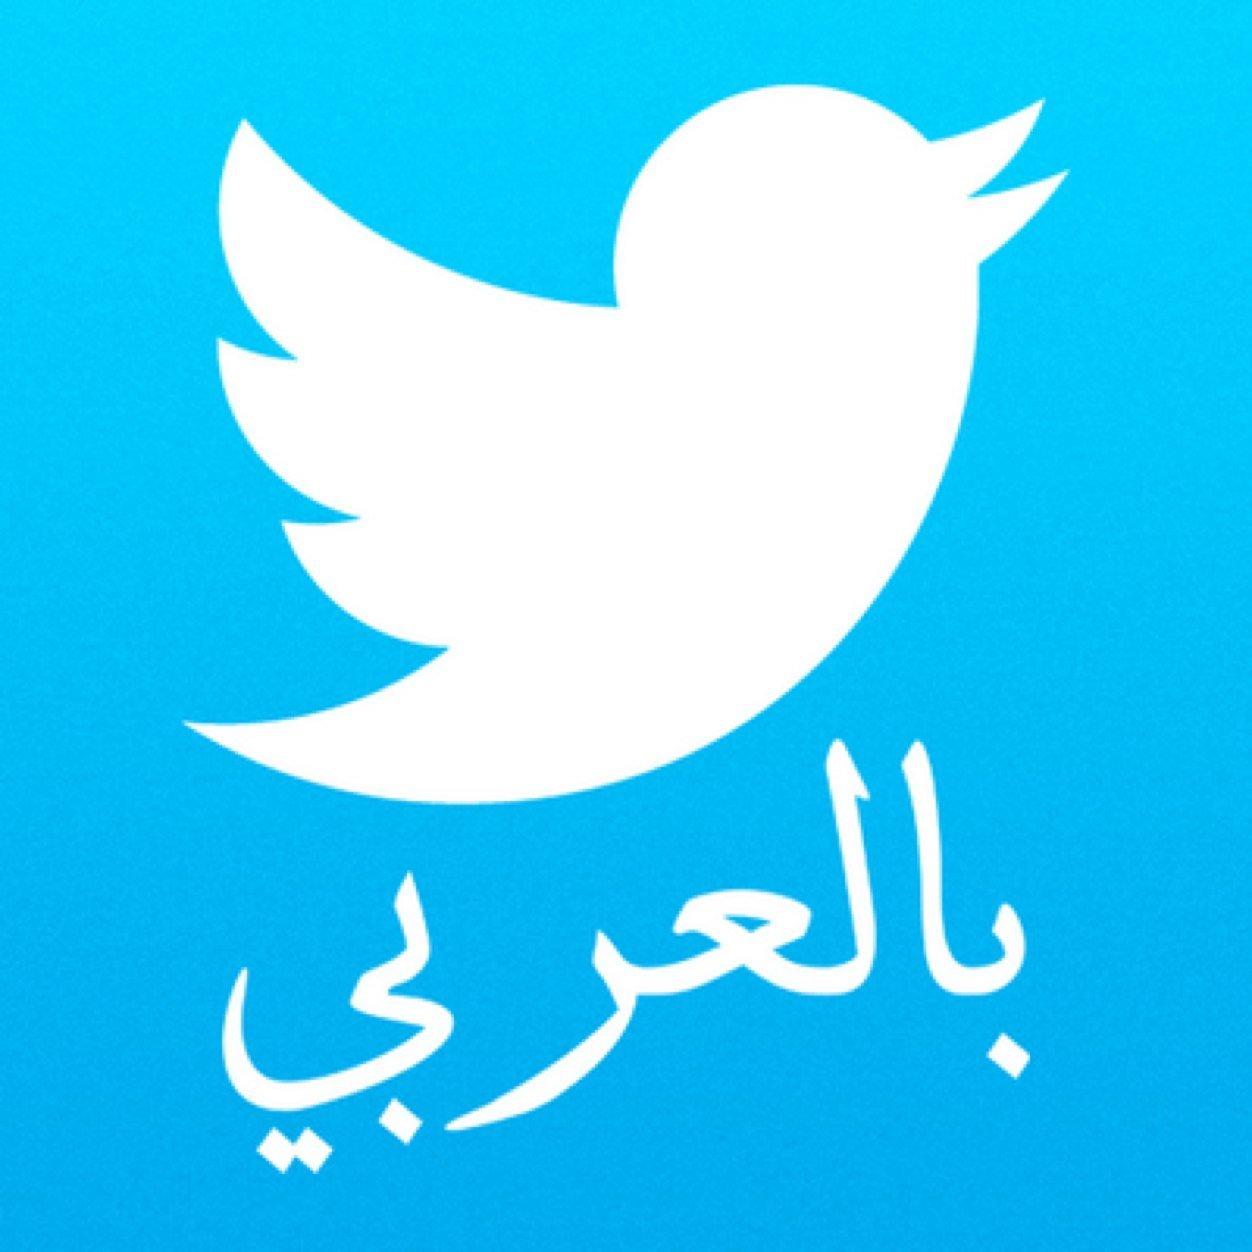 تويتر عربي Twittearbic Twitter